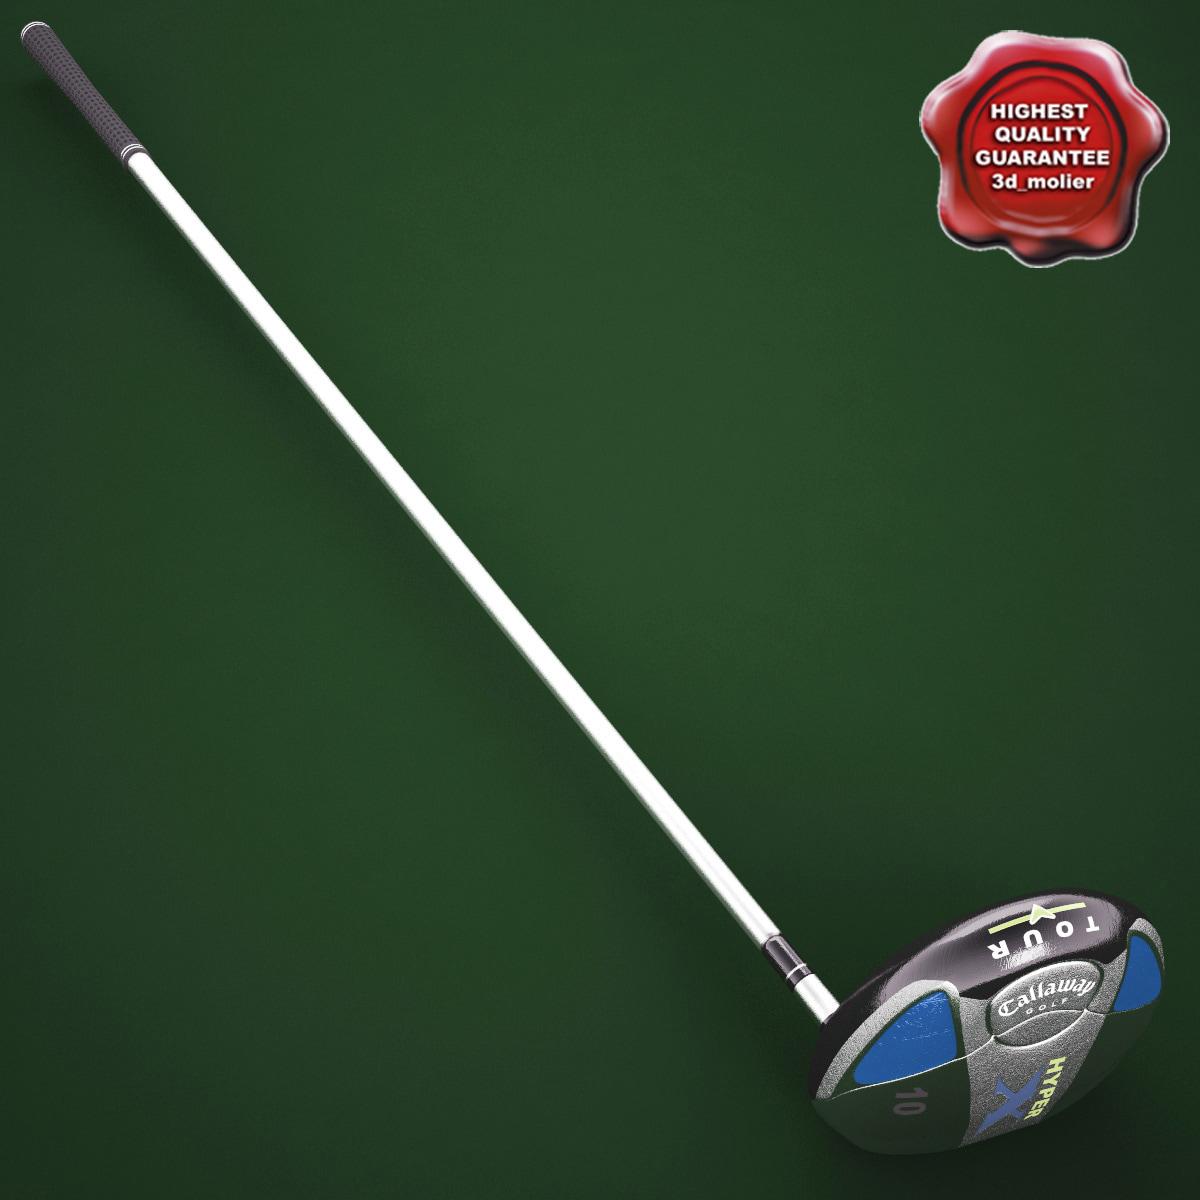 Golf_Callaway_Hyper_X_Driver_00.jpg